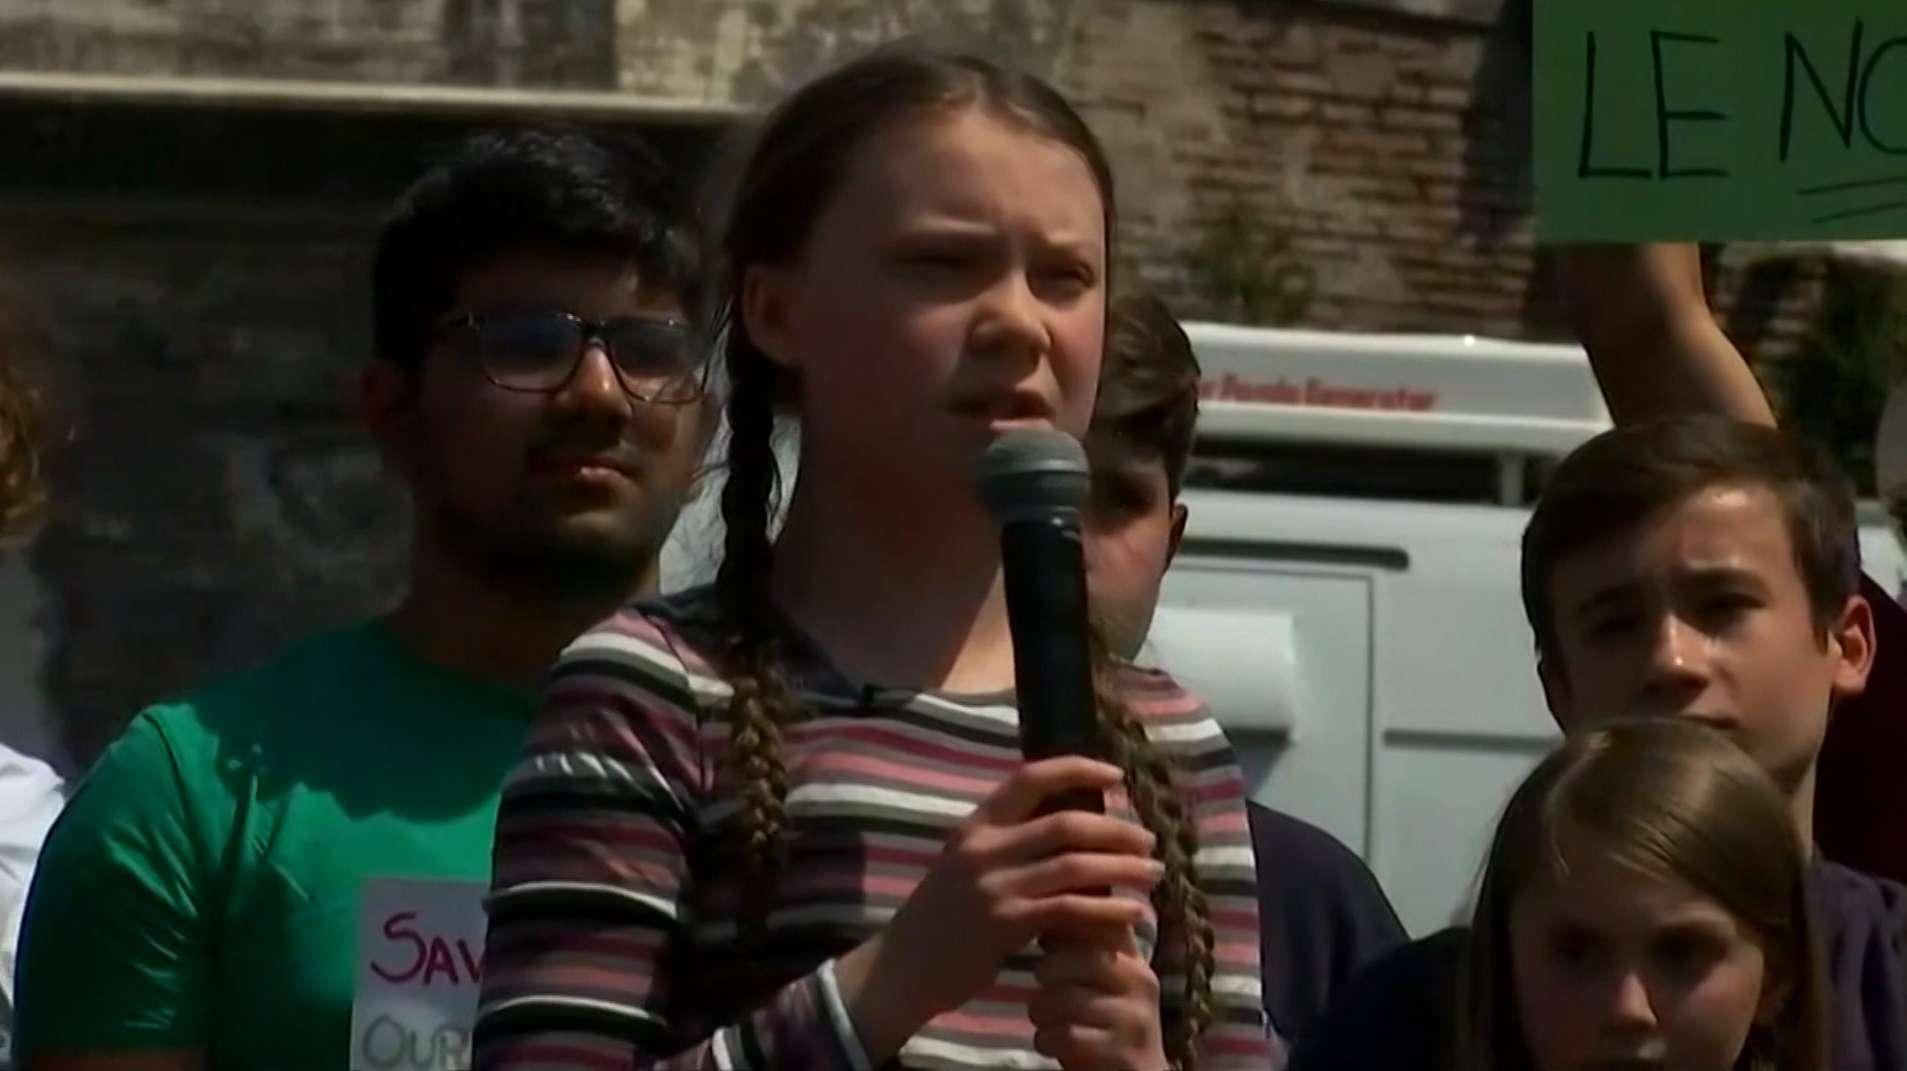 Greta Thunberg, Klimaschutzaktivistin